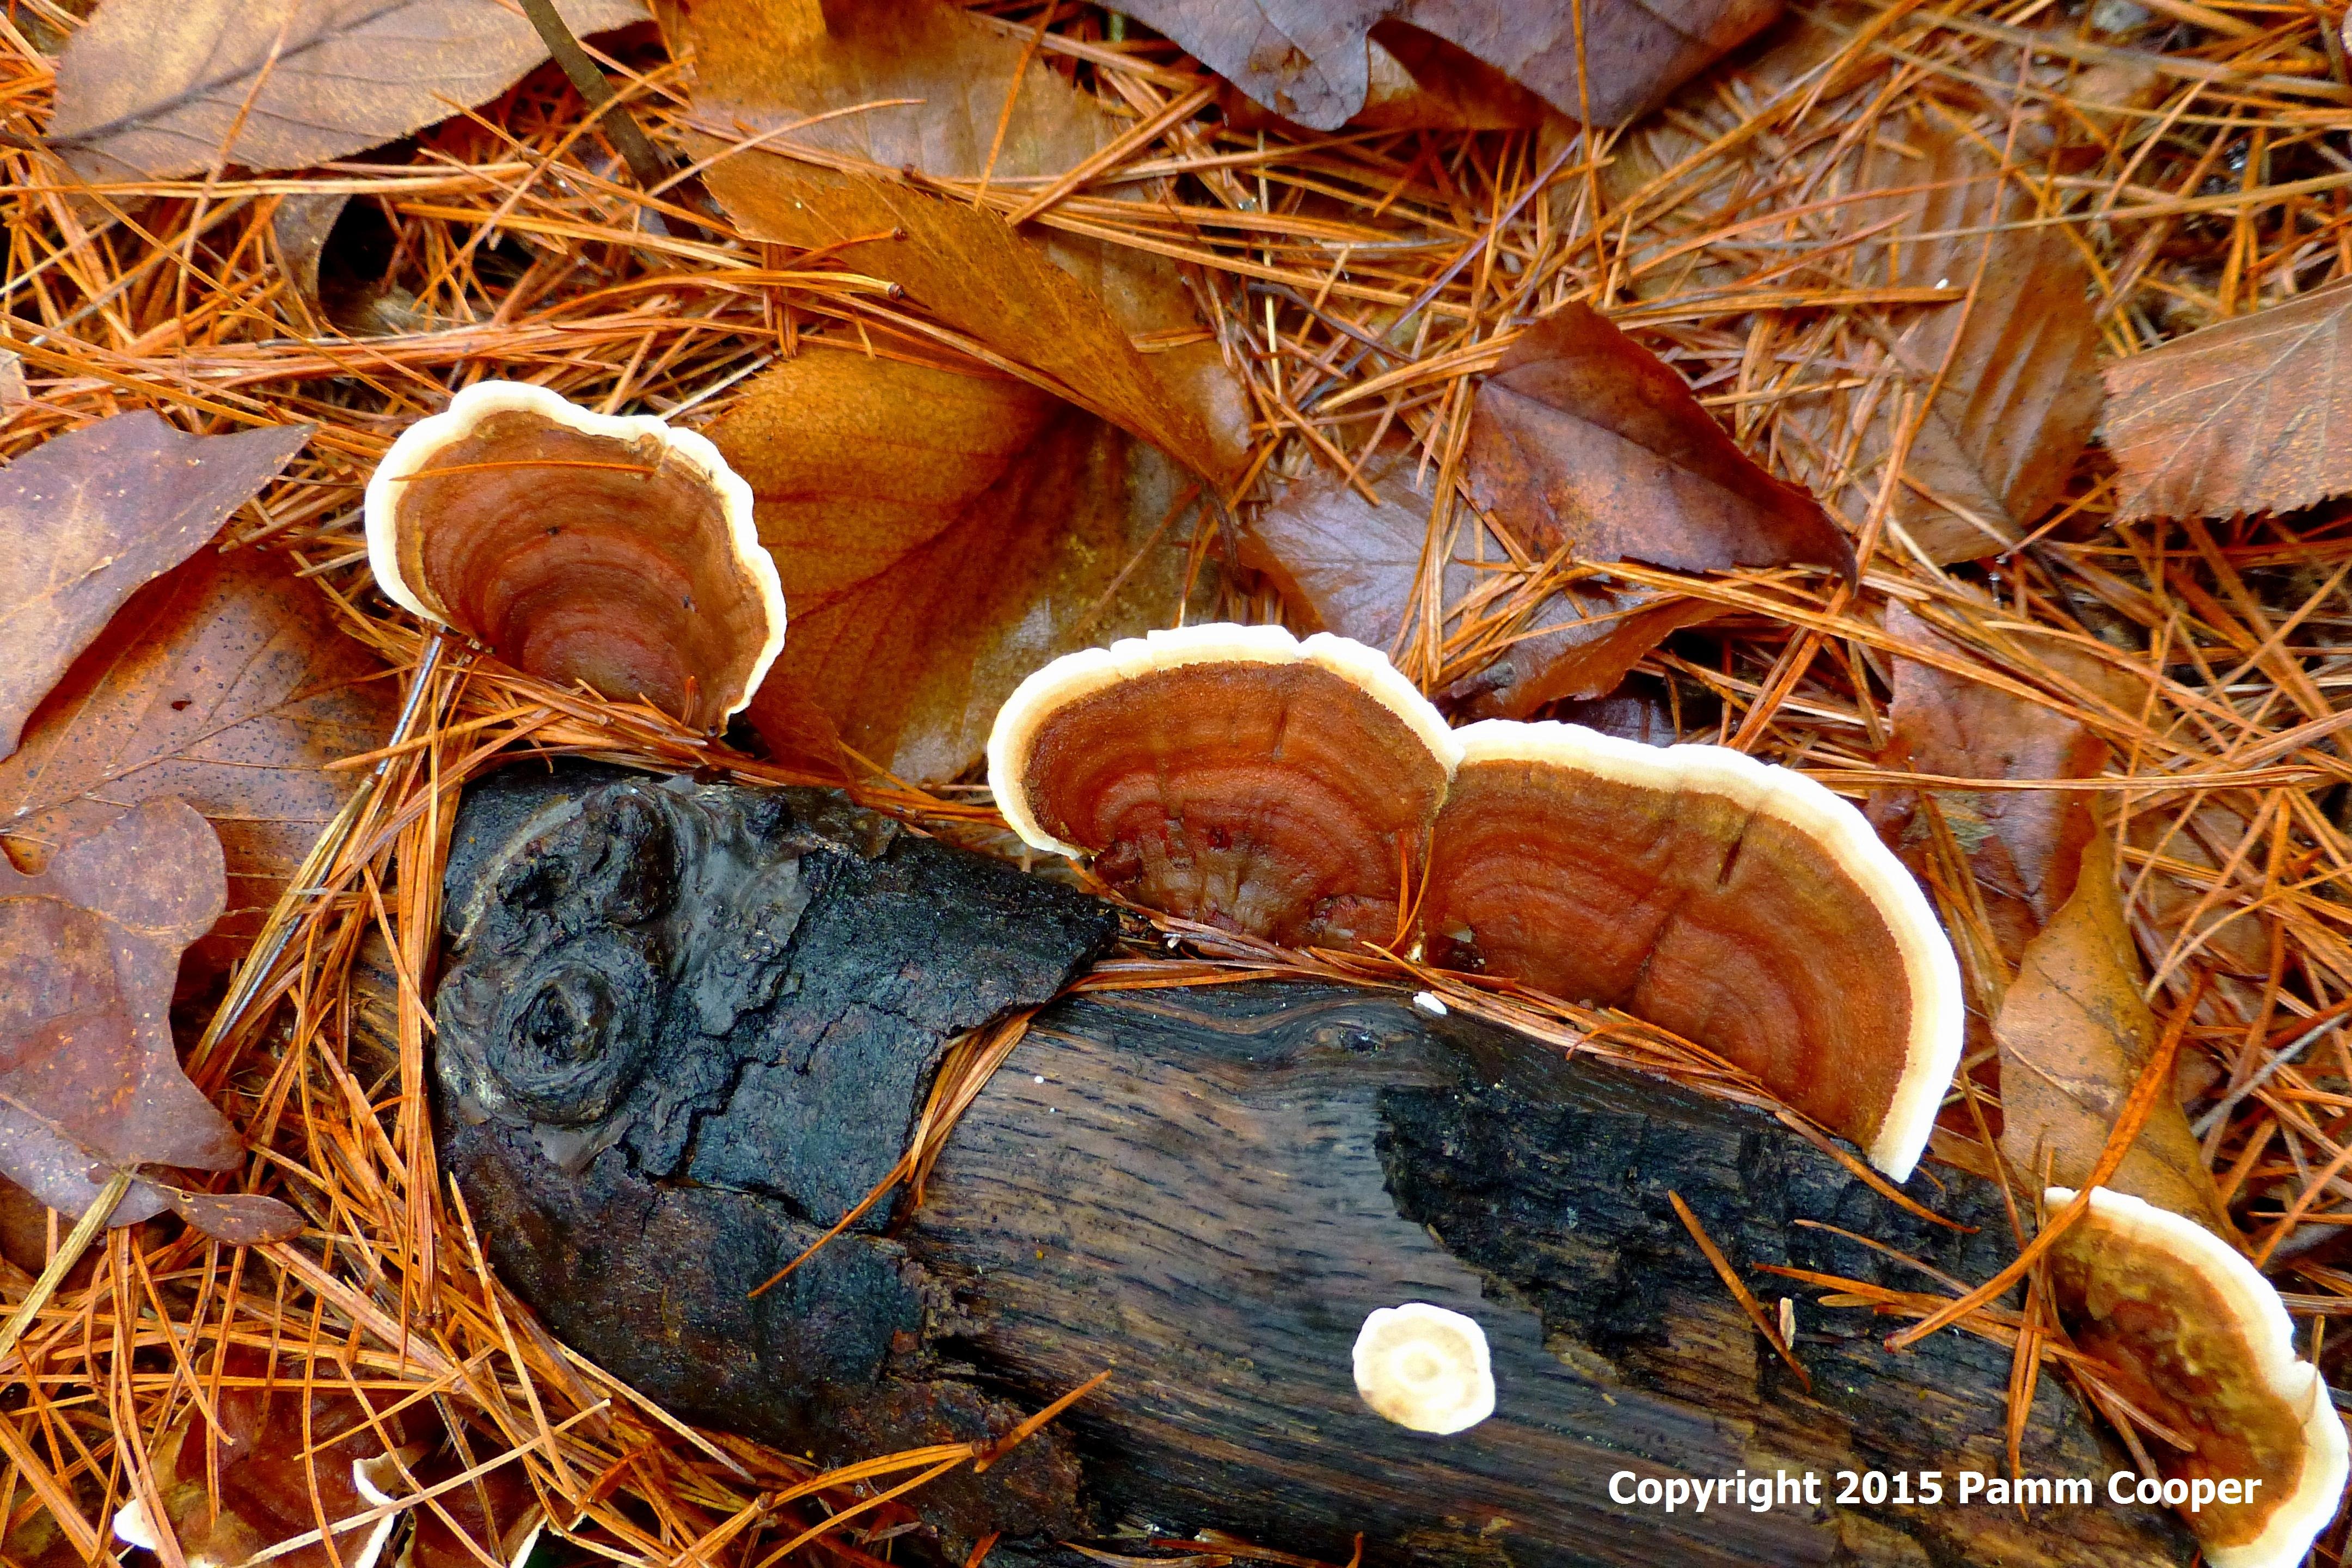 turky tail polypore shelf fungi.